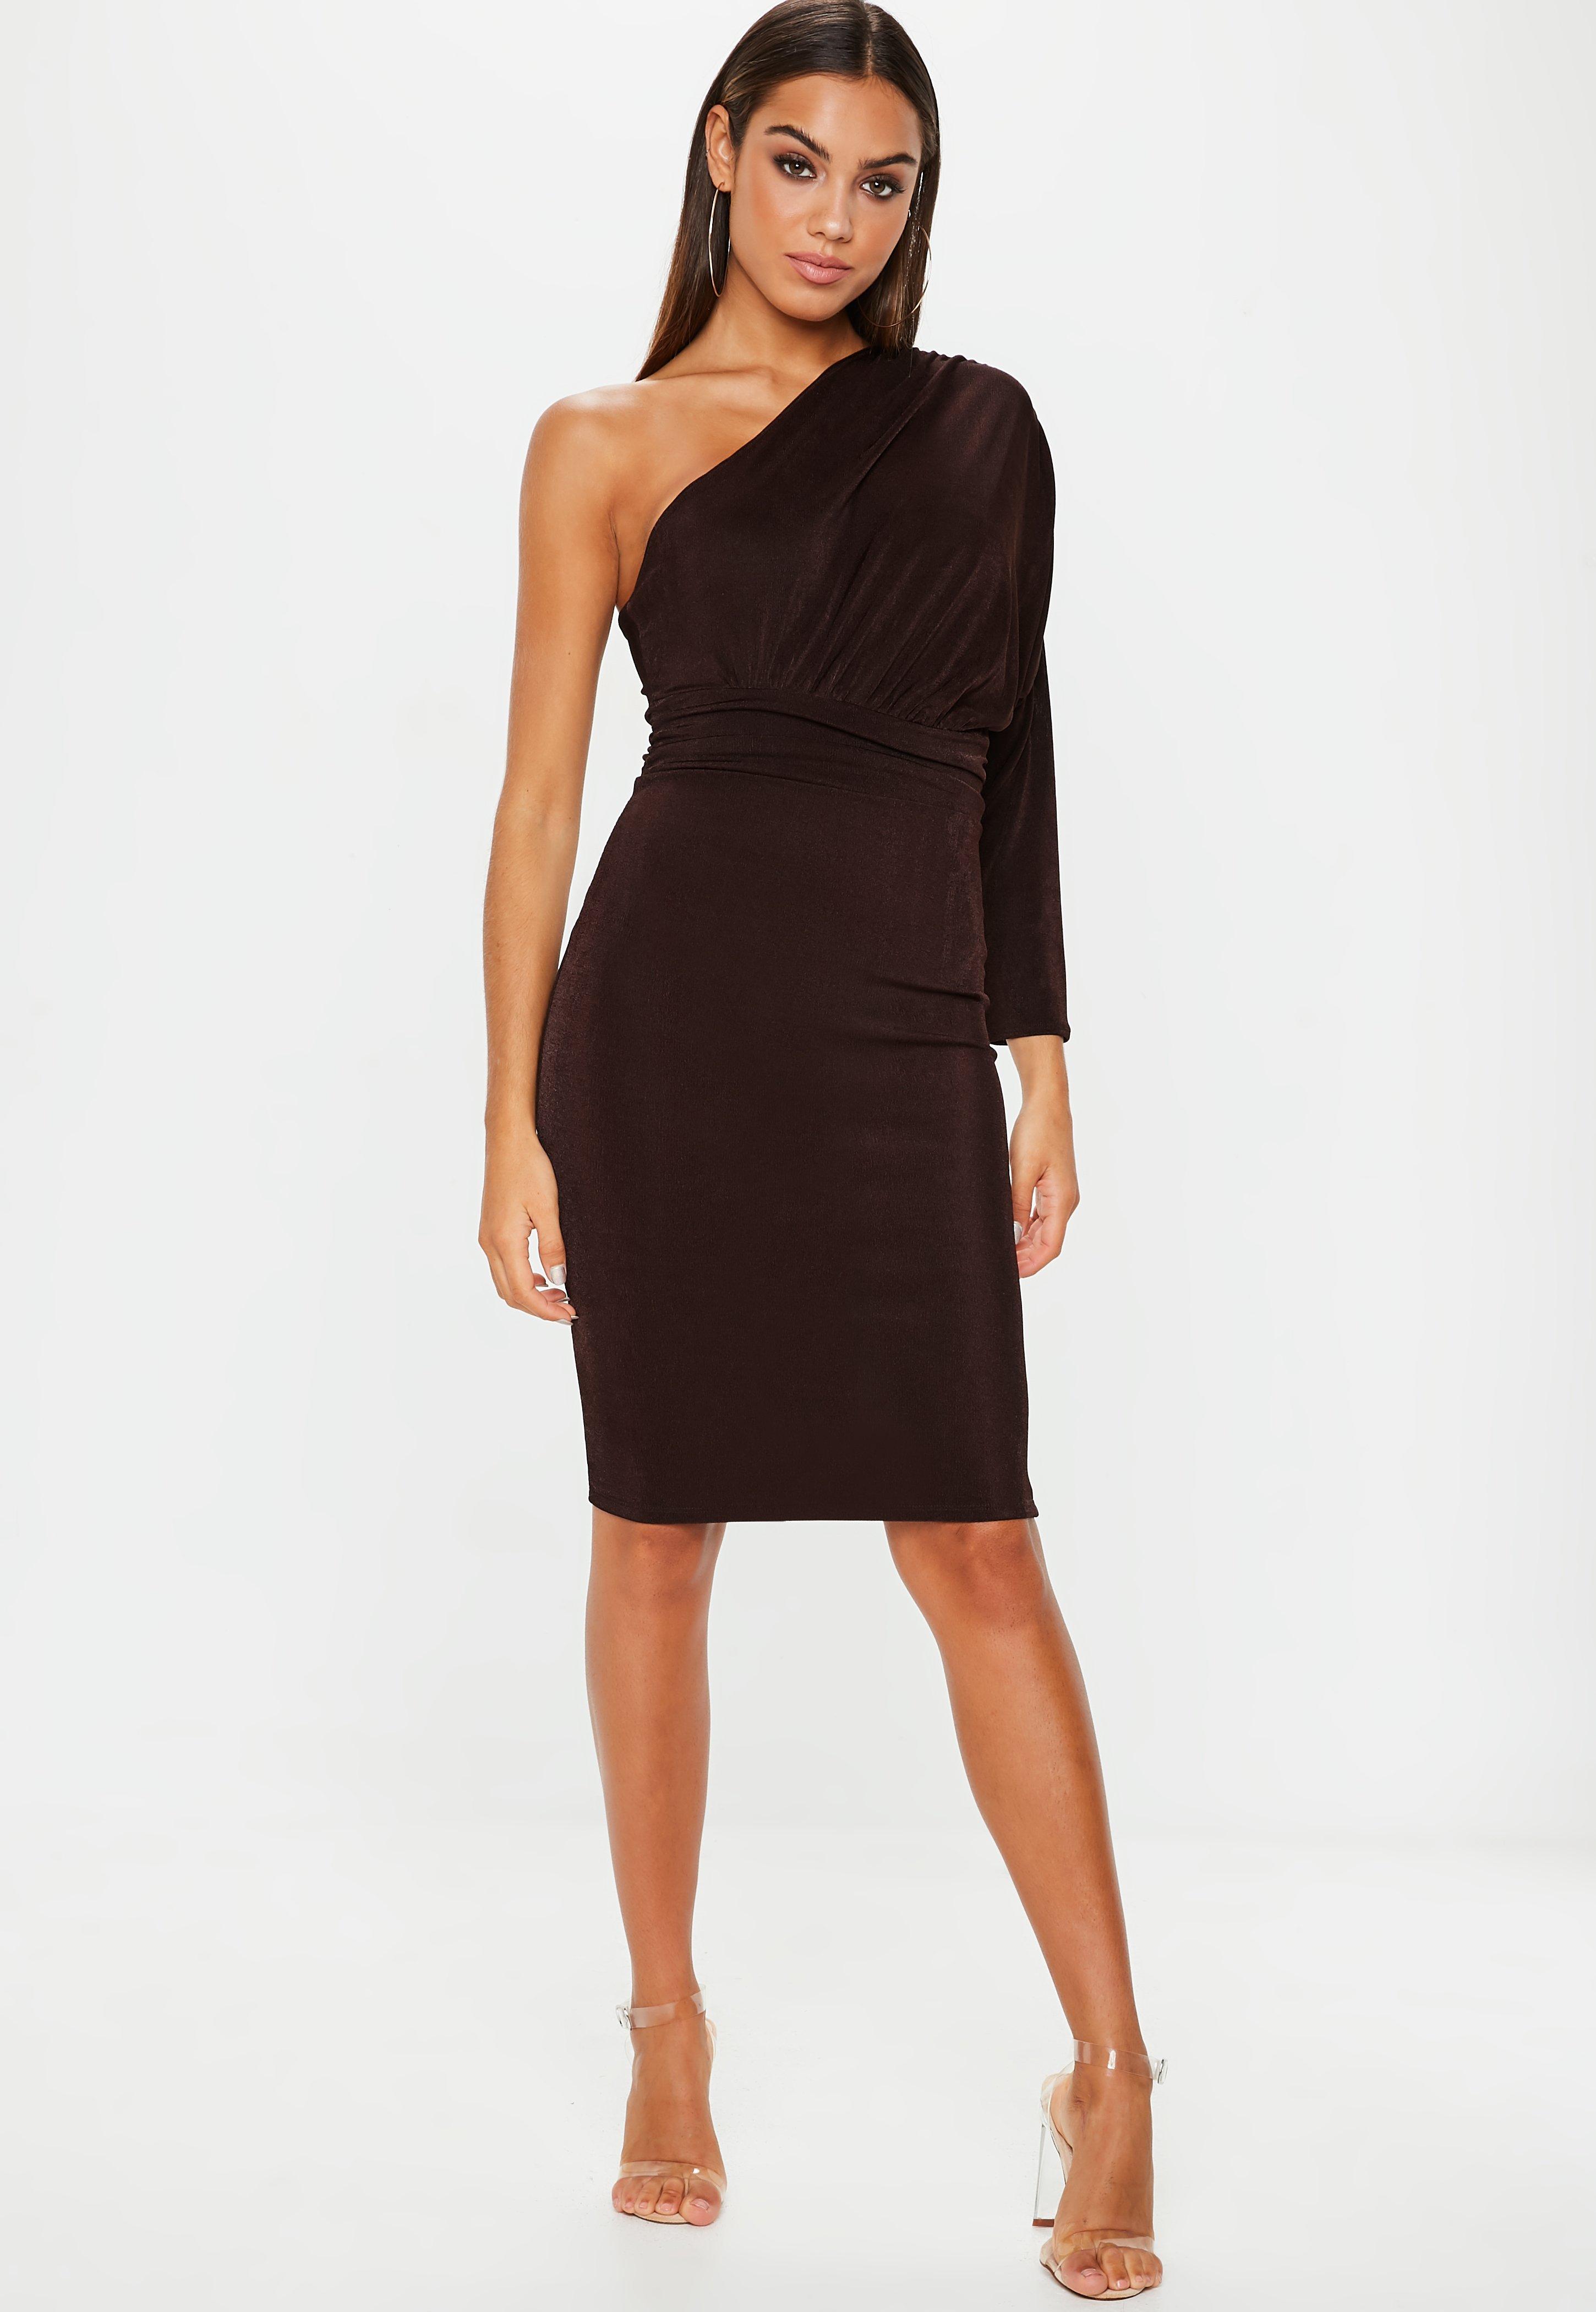 Looks - One little shoulder black dress video